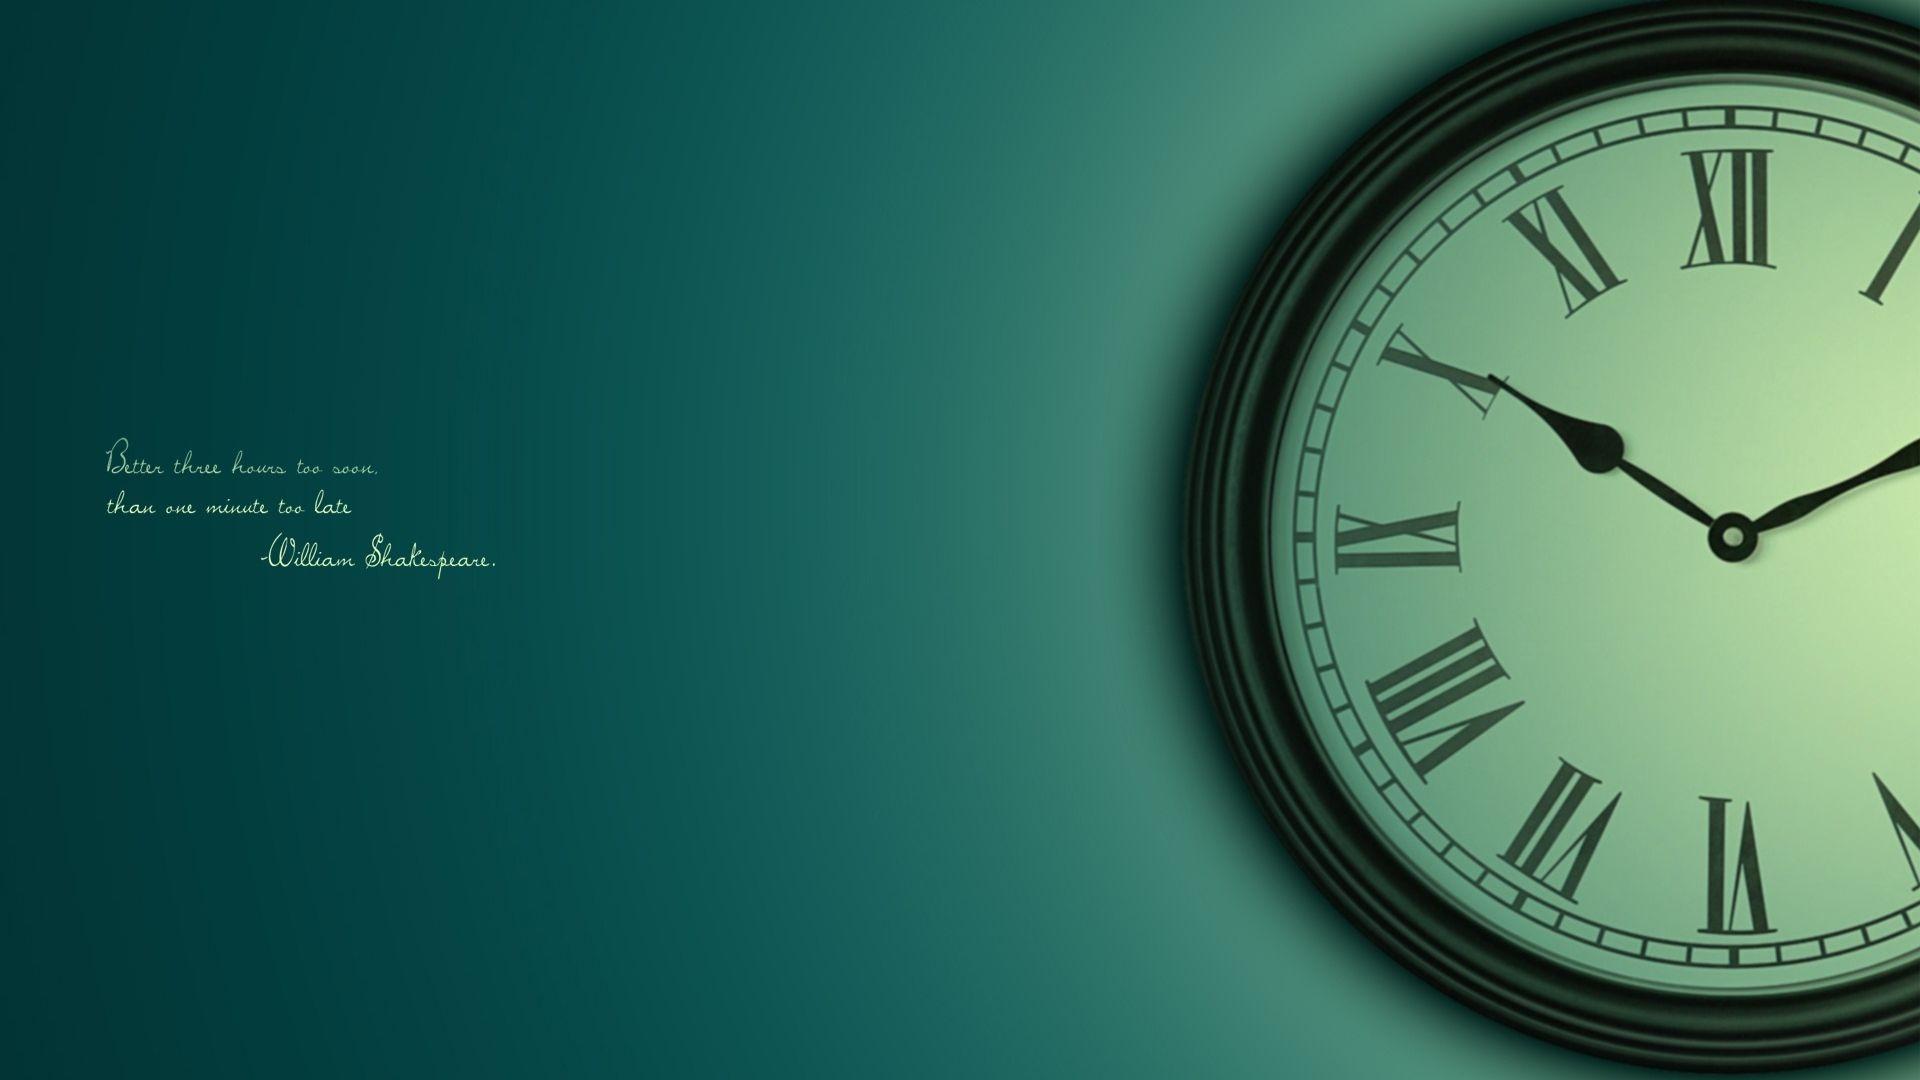 Download Wallpaper 1920x1080 Clock Time Dial Saying Sage Full Hd 1080p Hd Backgrou Clock Wallpaper Inspirational Desktop Wallpaper Desktop Wallpaper Quotes